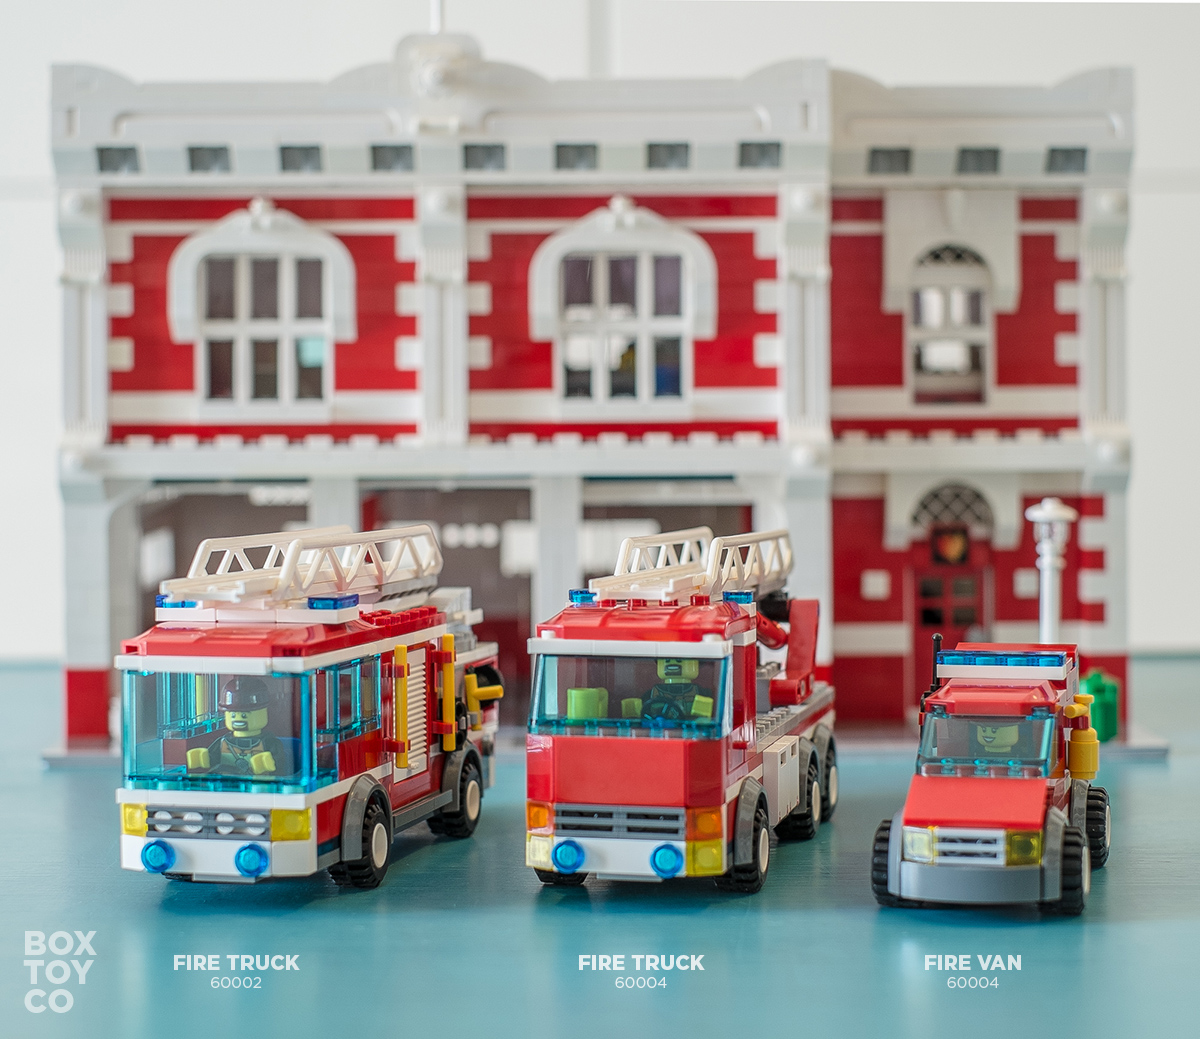 Lego Fire Station Moc Boxtoy